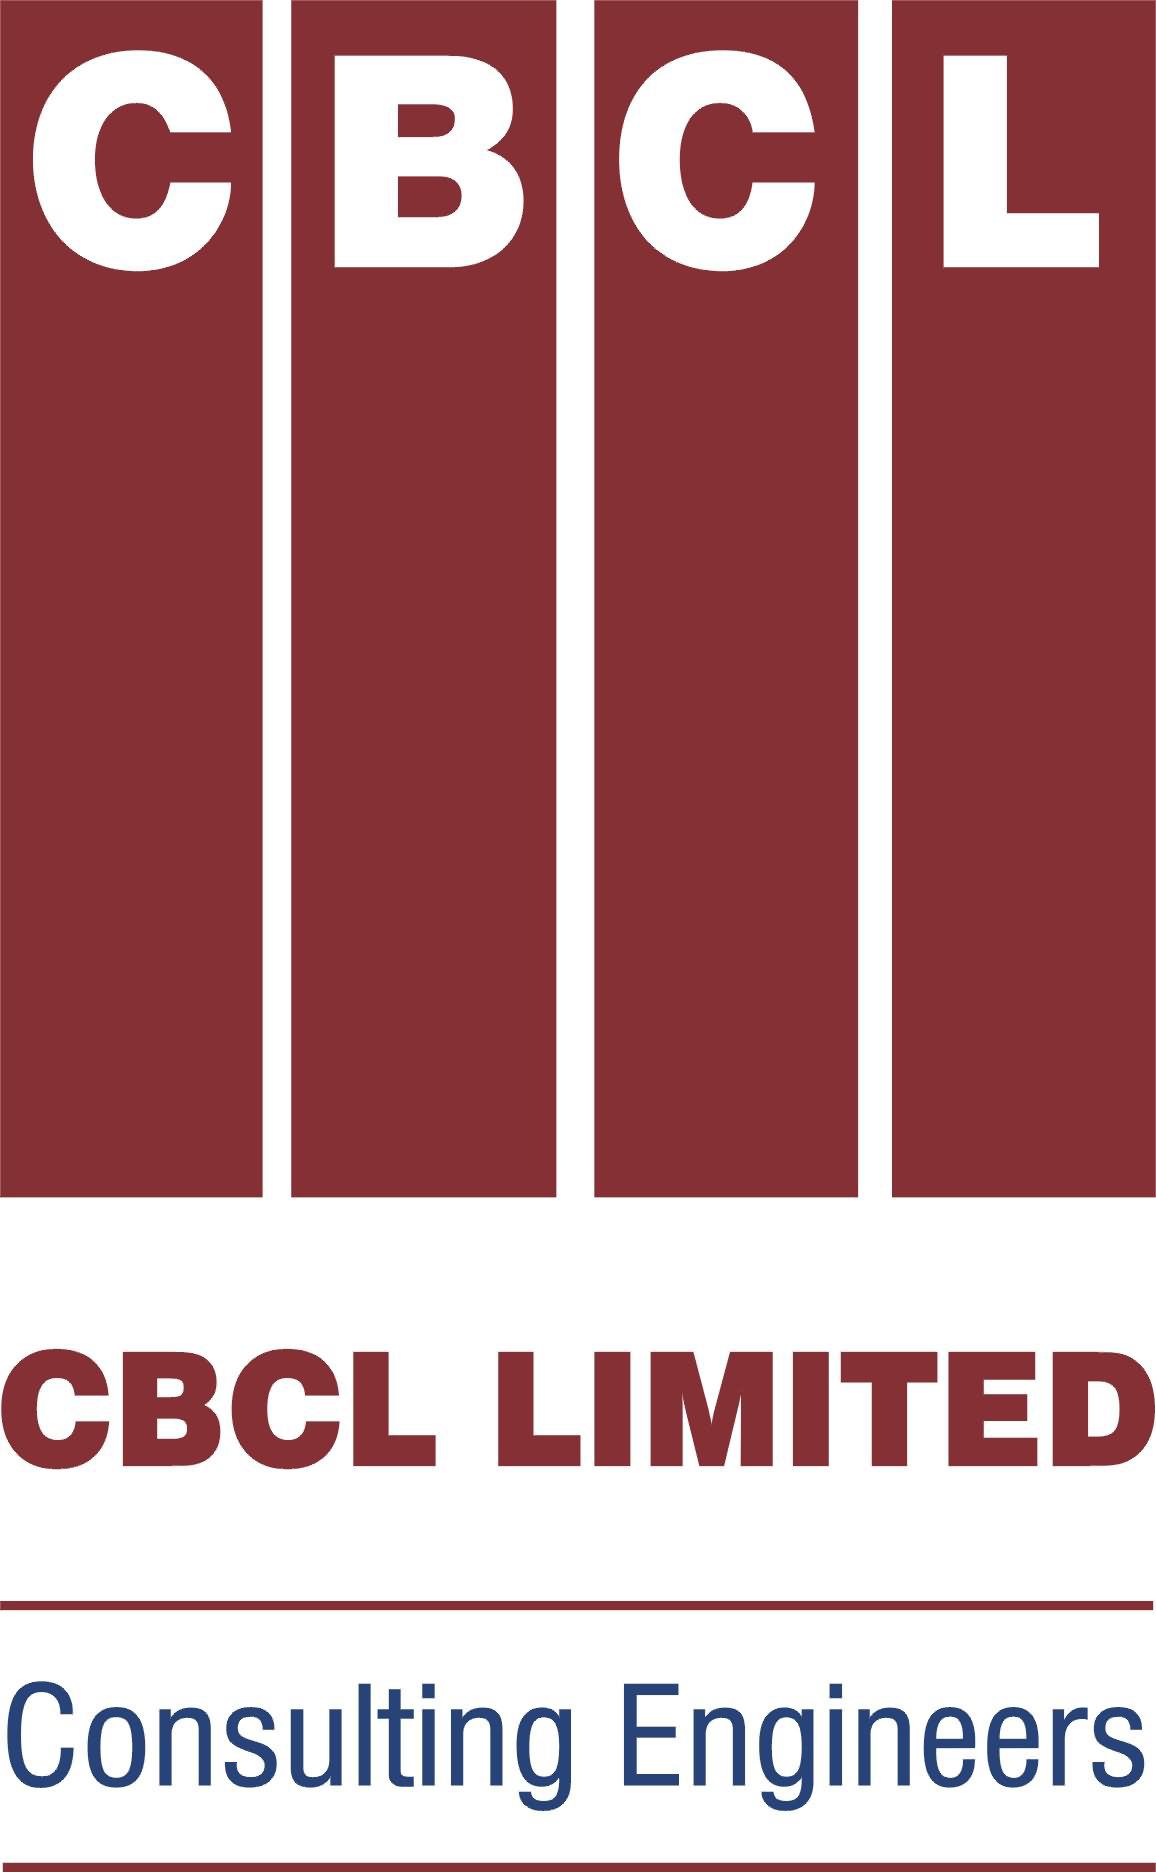 CBCL Logo Hi Rez.jpg